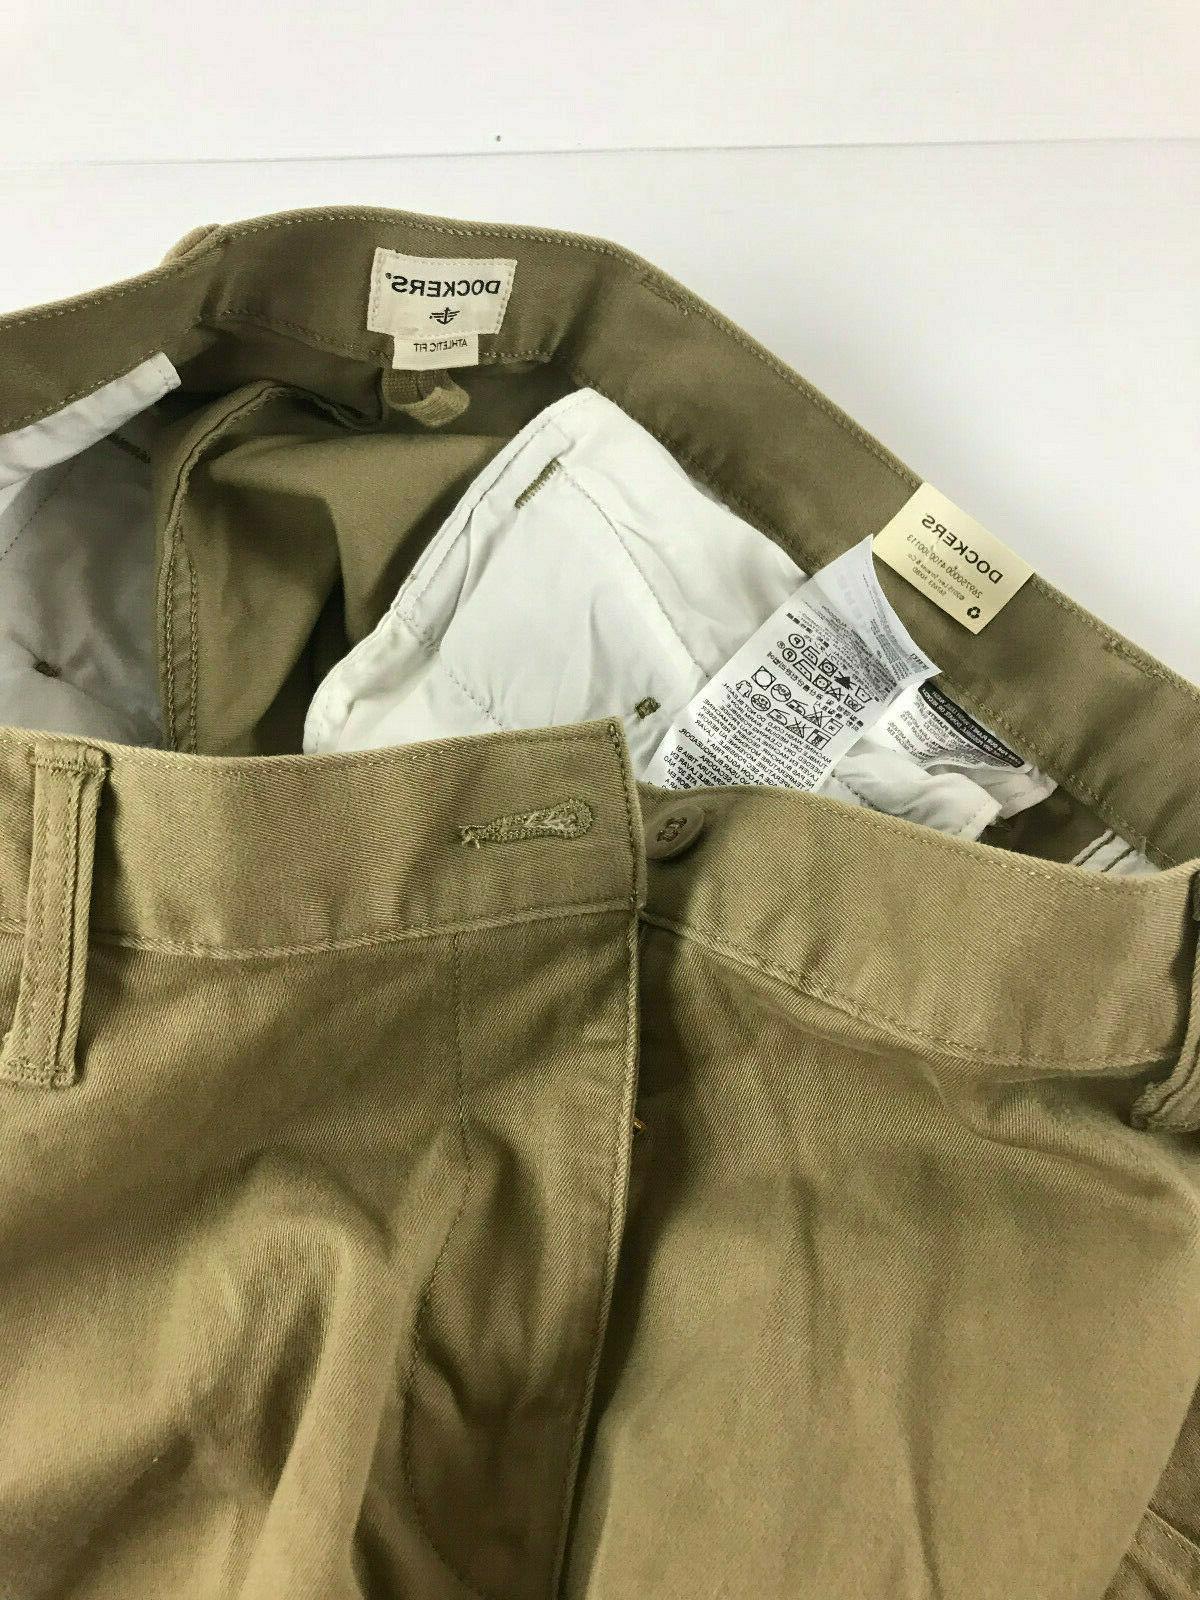 Dockers pants 38X34